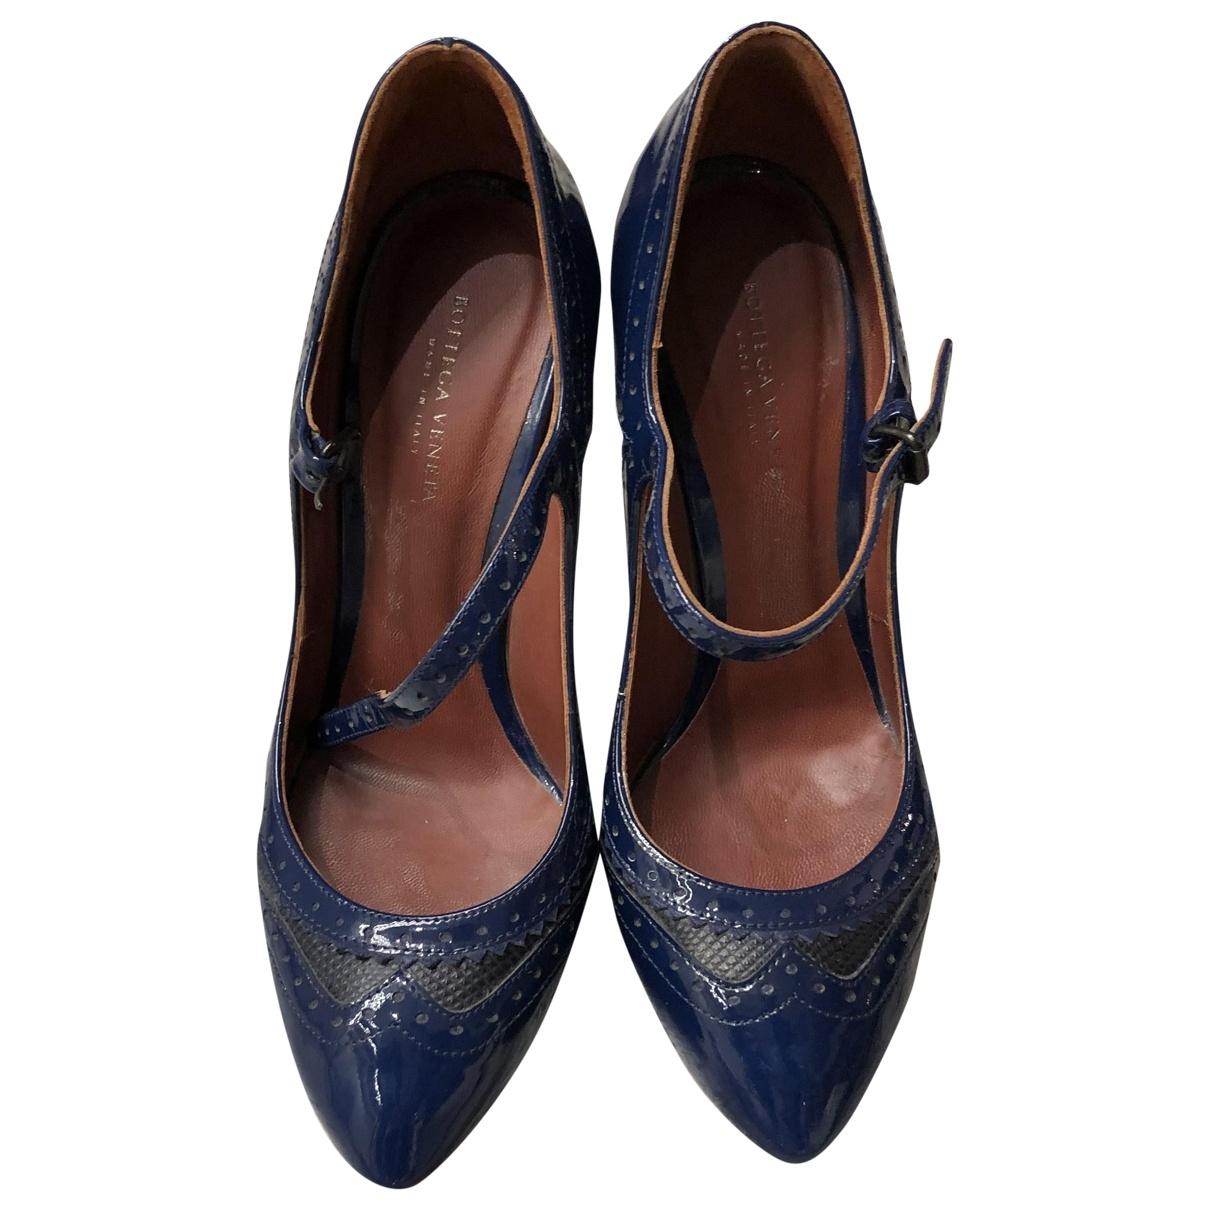 Bottega Veneta - Escarpins   pour femme en cuir verni - bleu